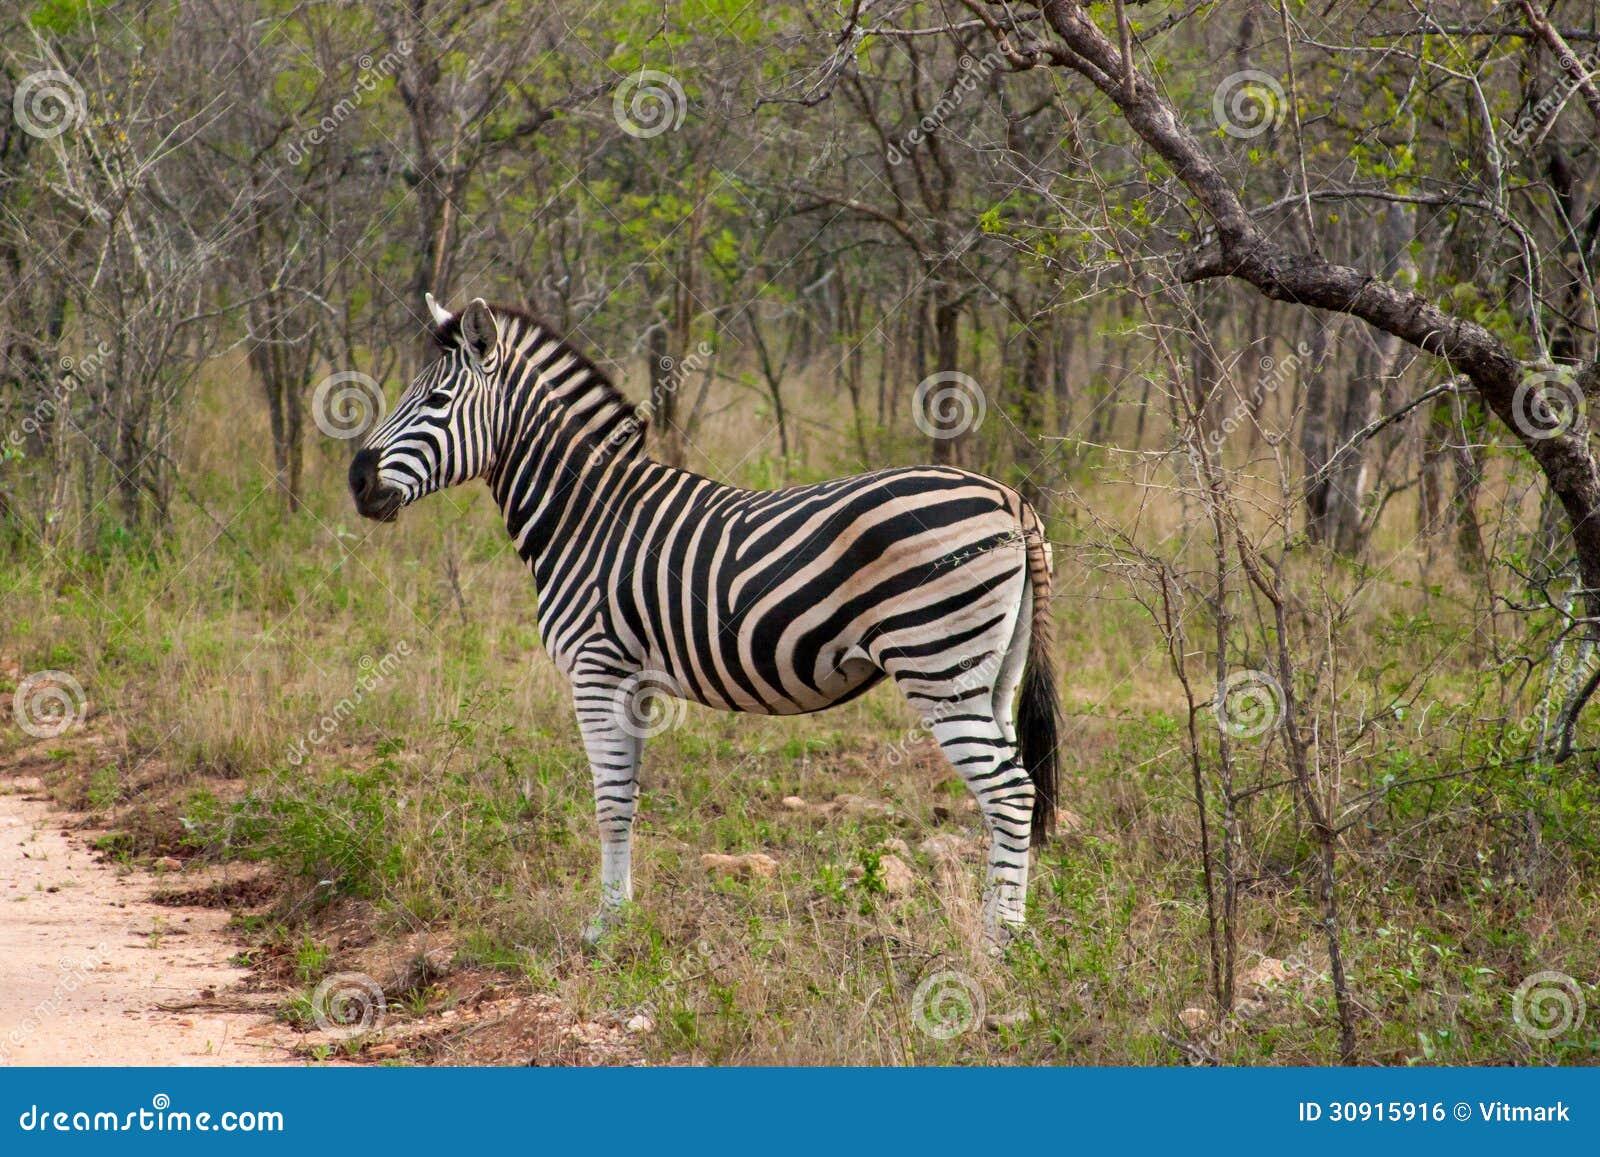 Parques Naturales de Sudáfrica